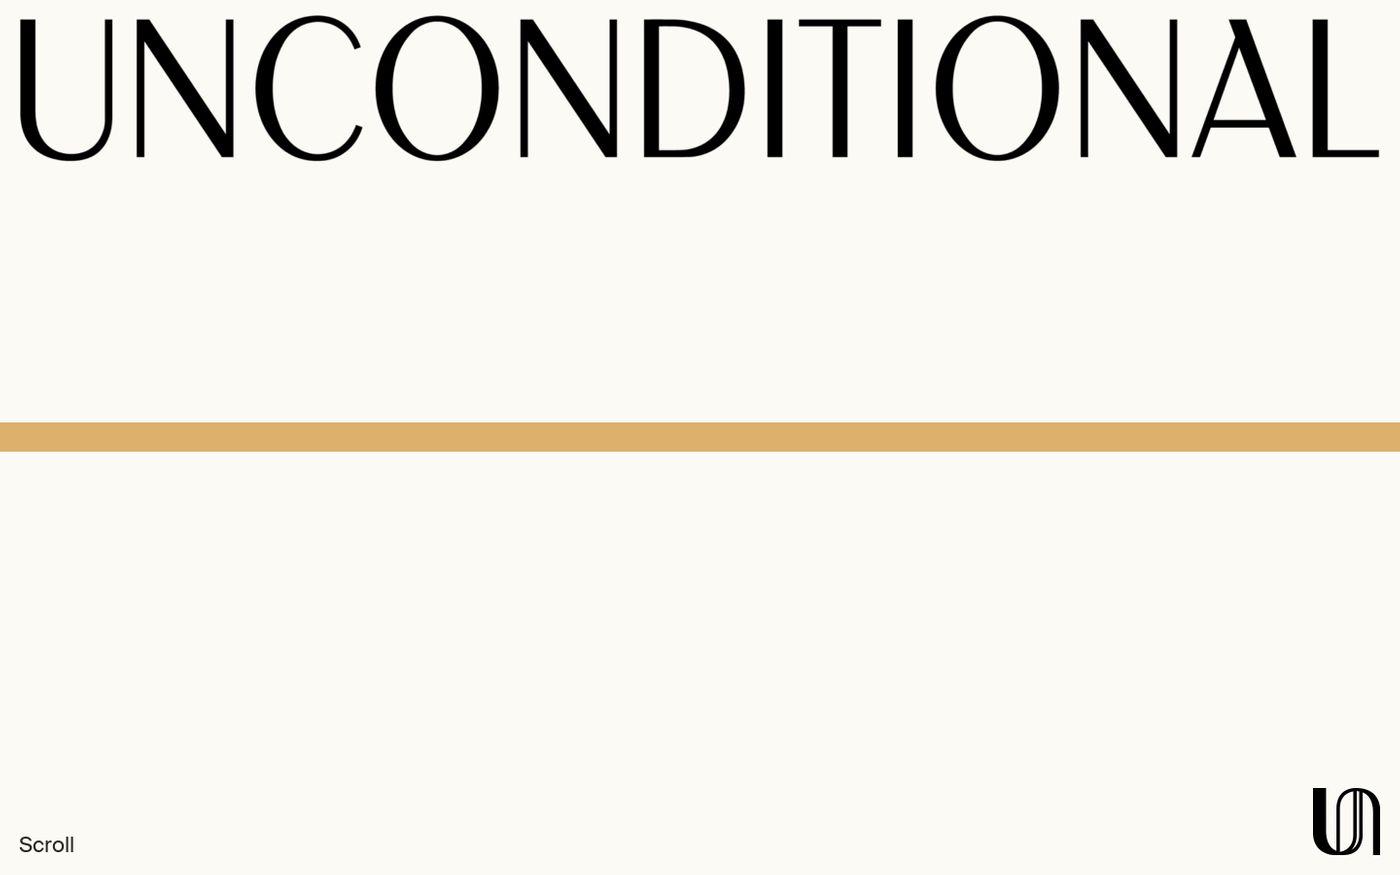 Screenshot of Unconditional magazine website